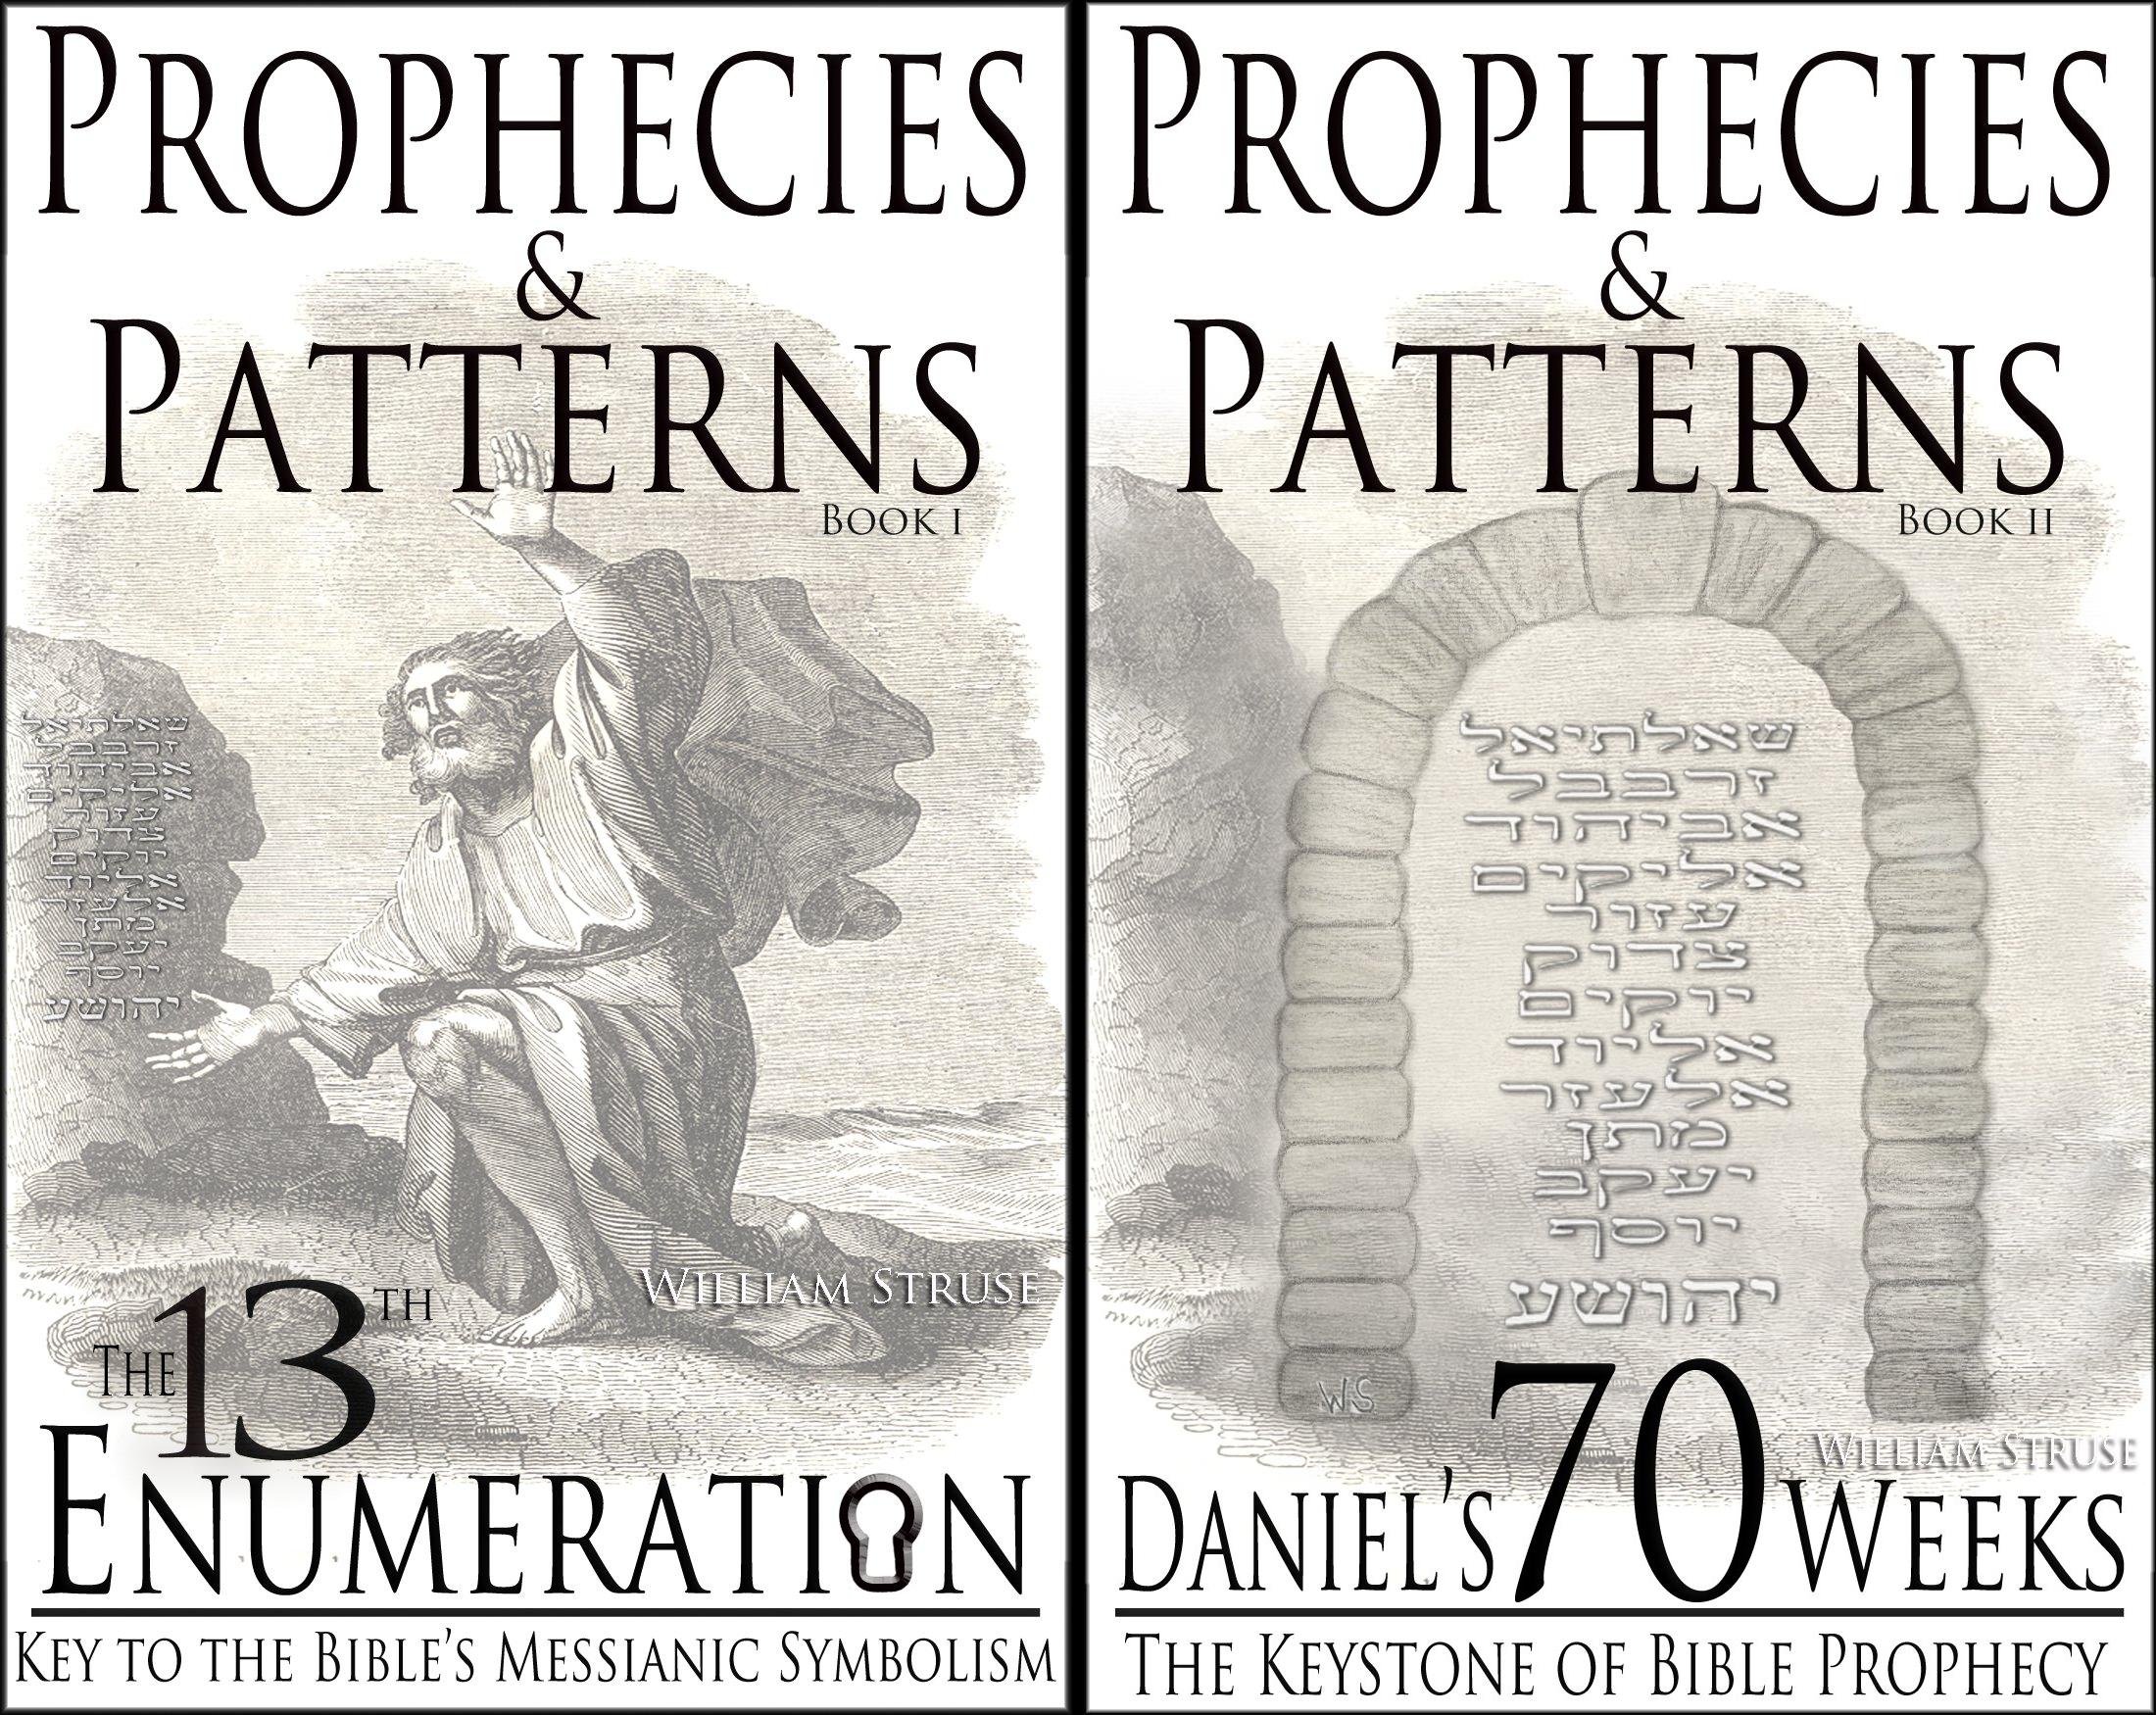 Prophecies & Patterns (2 Book Series)